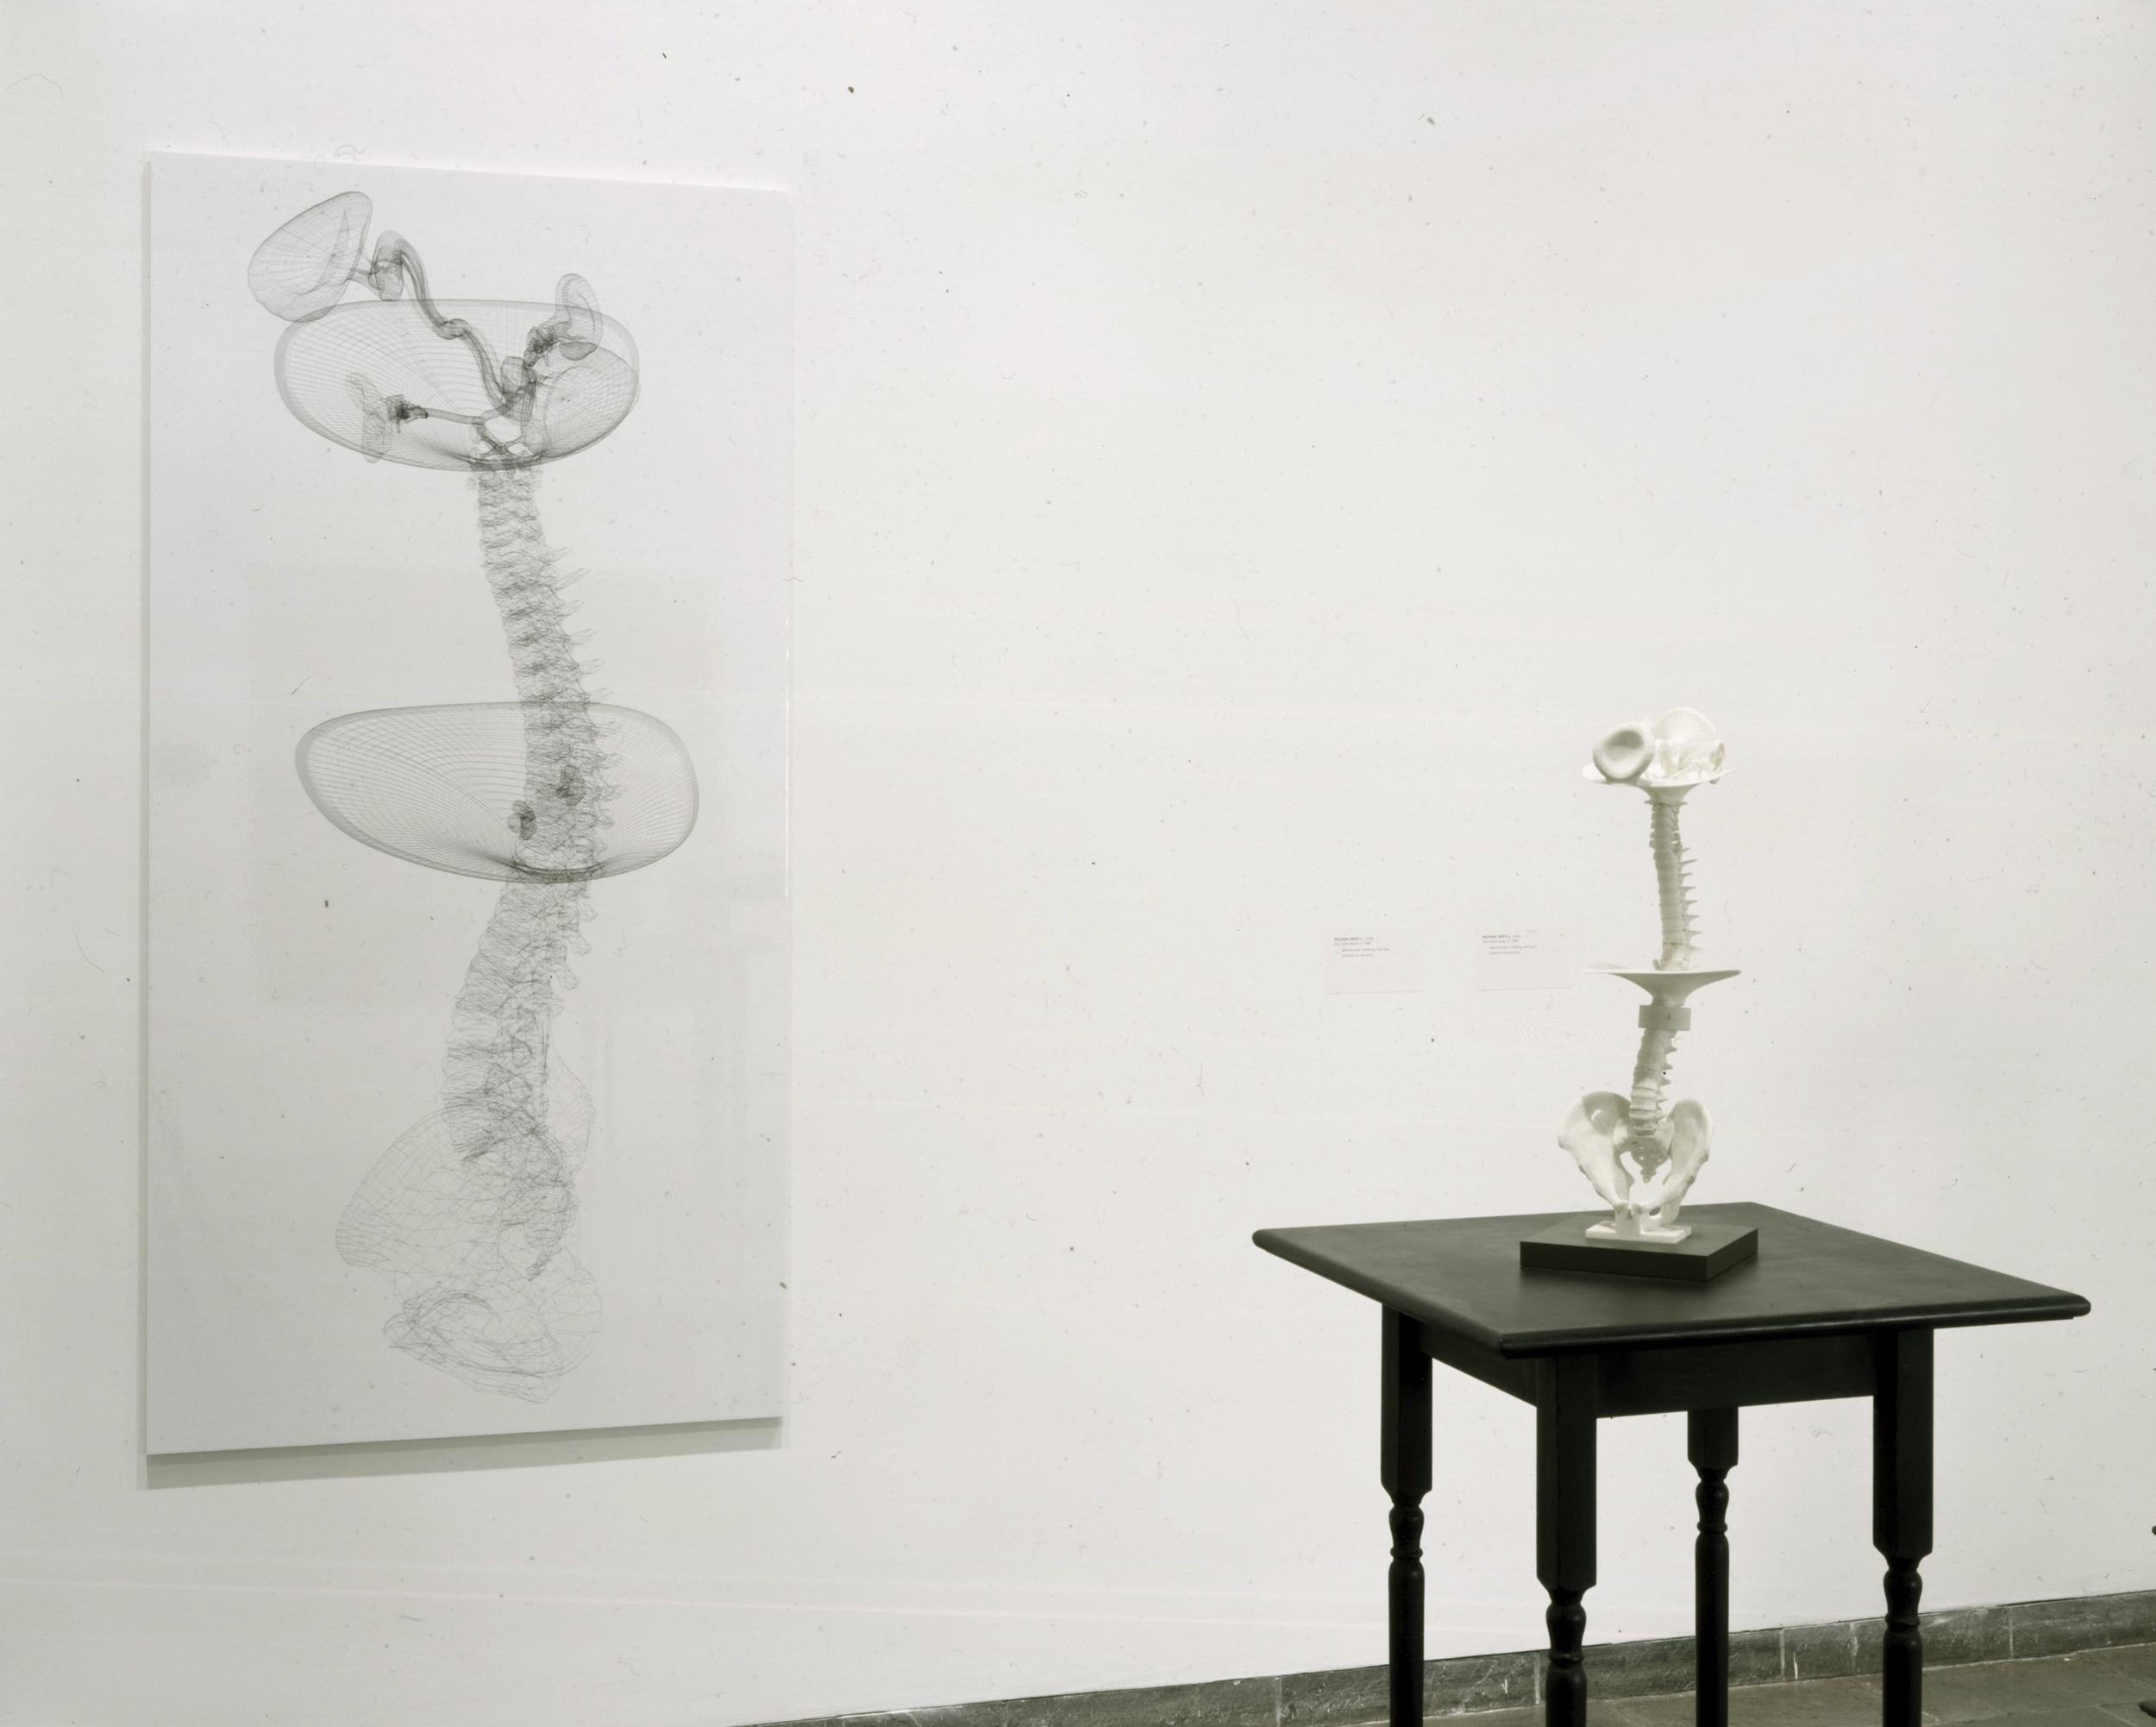 2001 Whitney Bitstreams Exhibition